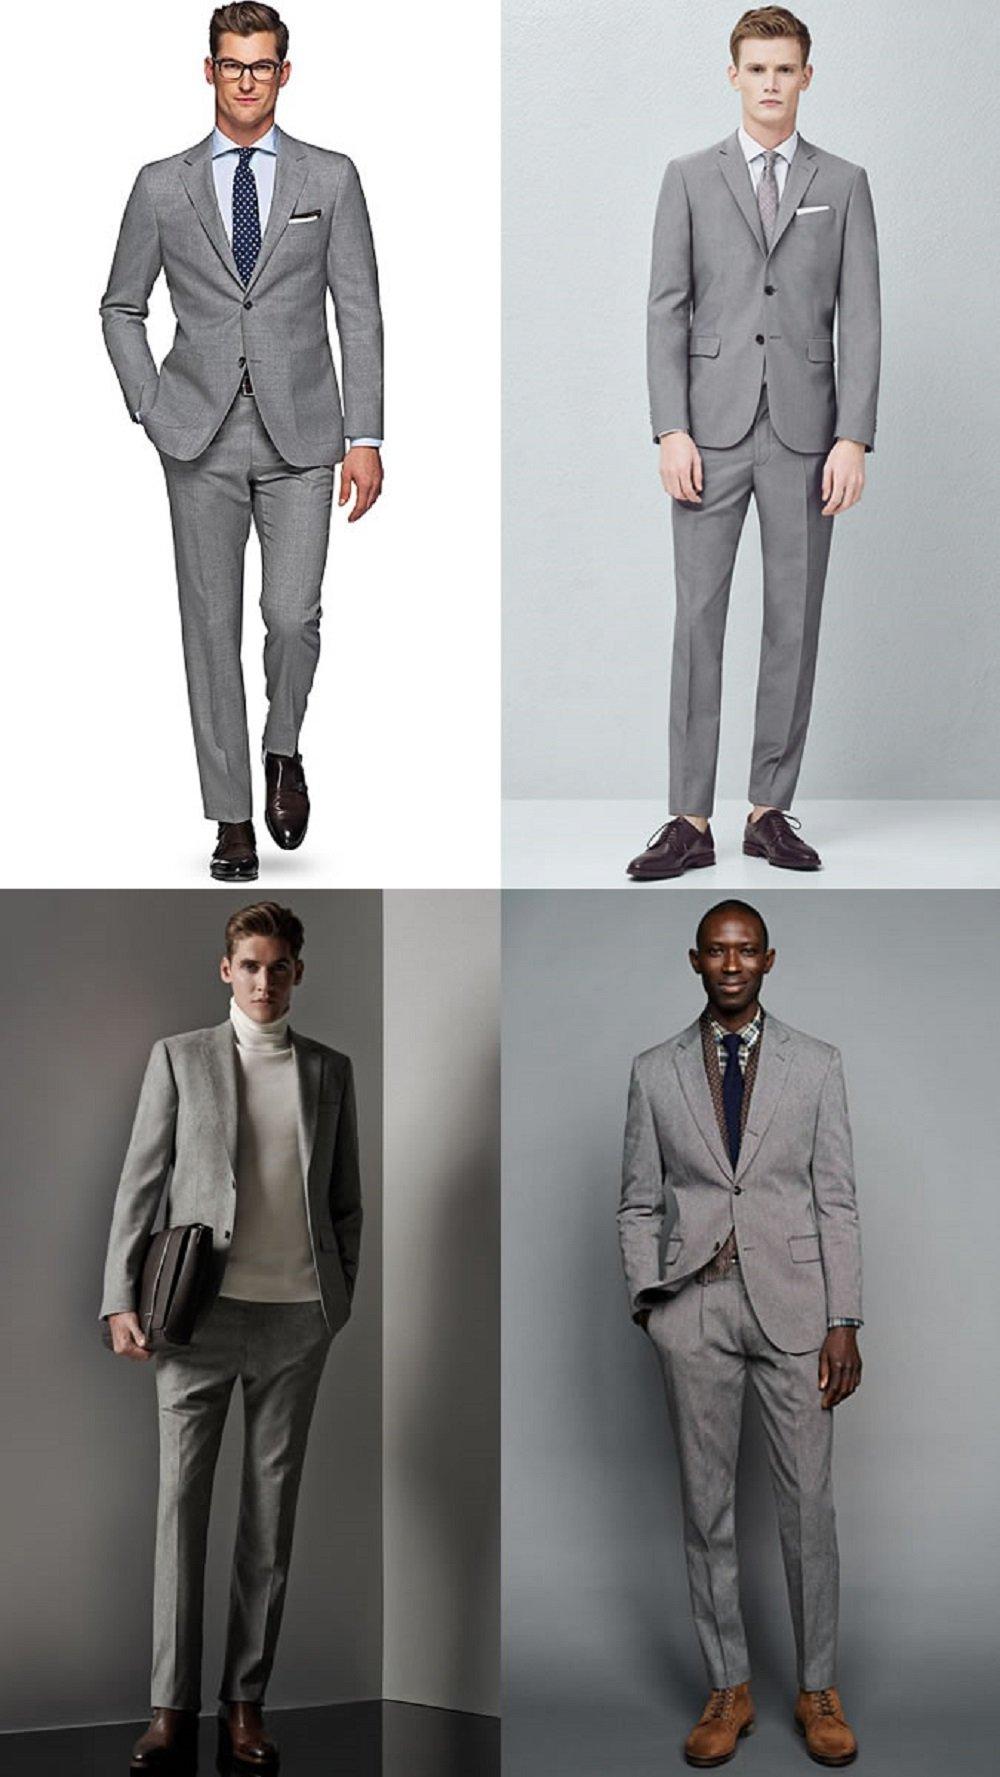 2-_lbdl-_lrjly-_lrmdy-_mzdwj-_lzr_-_grey_-two-button-_suit